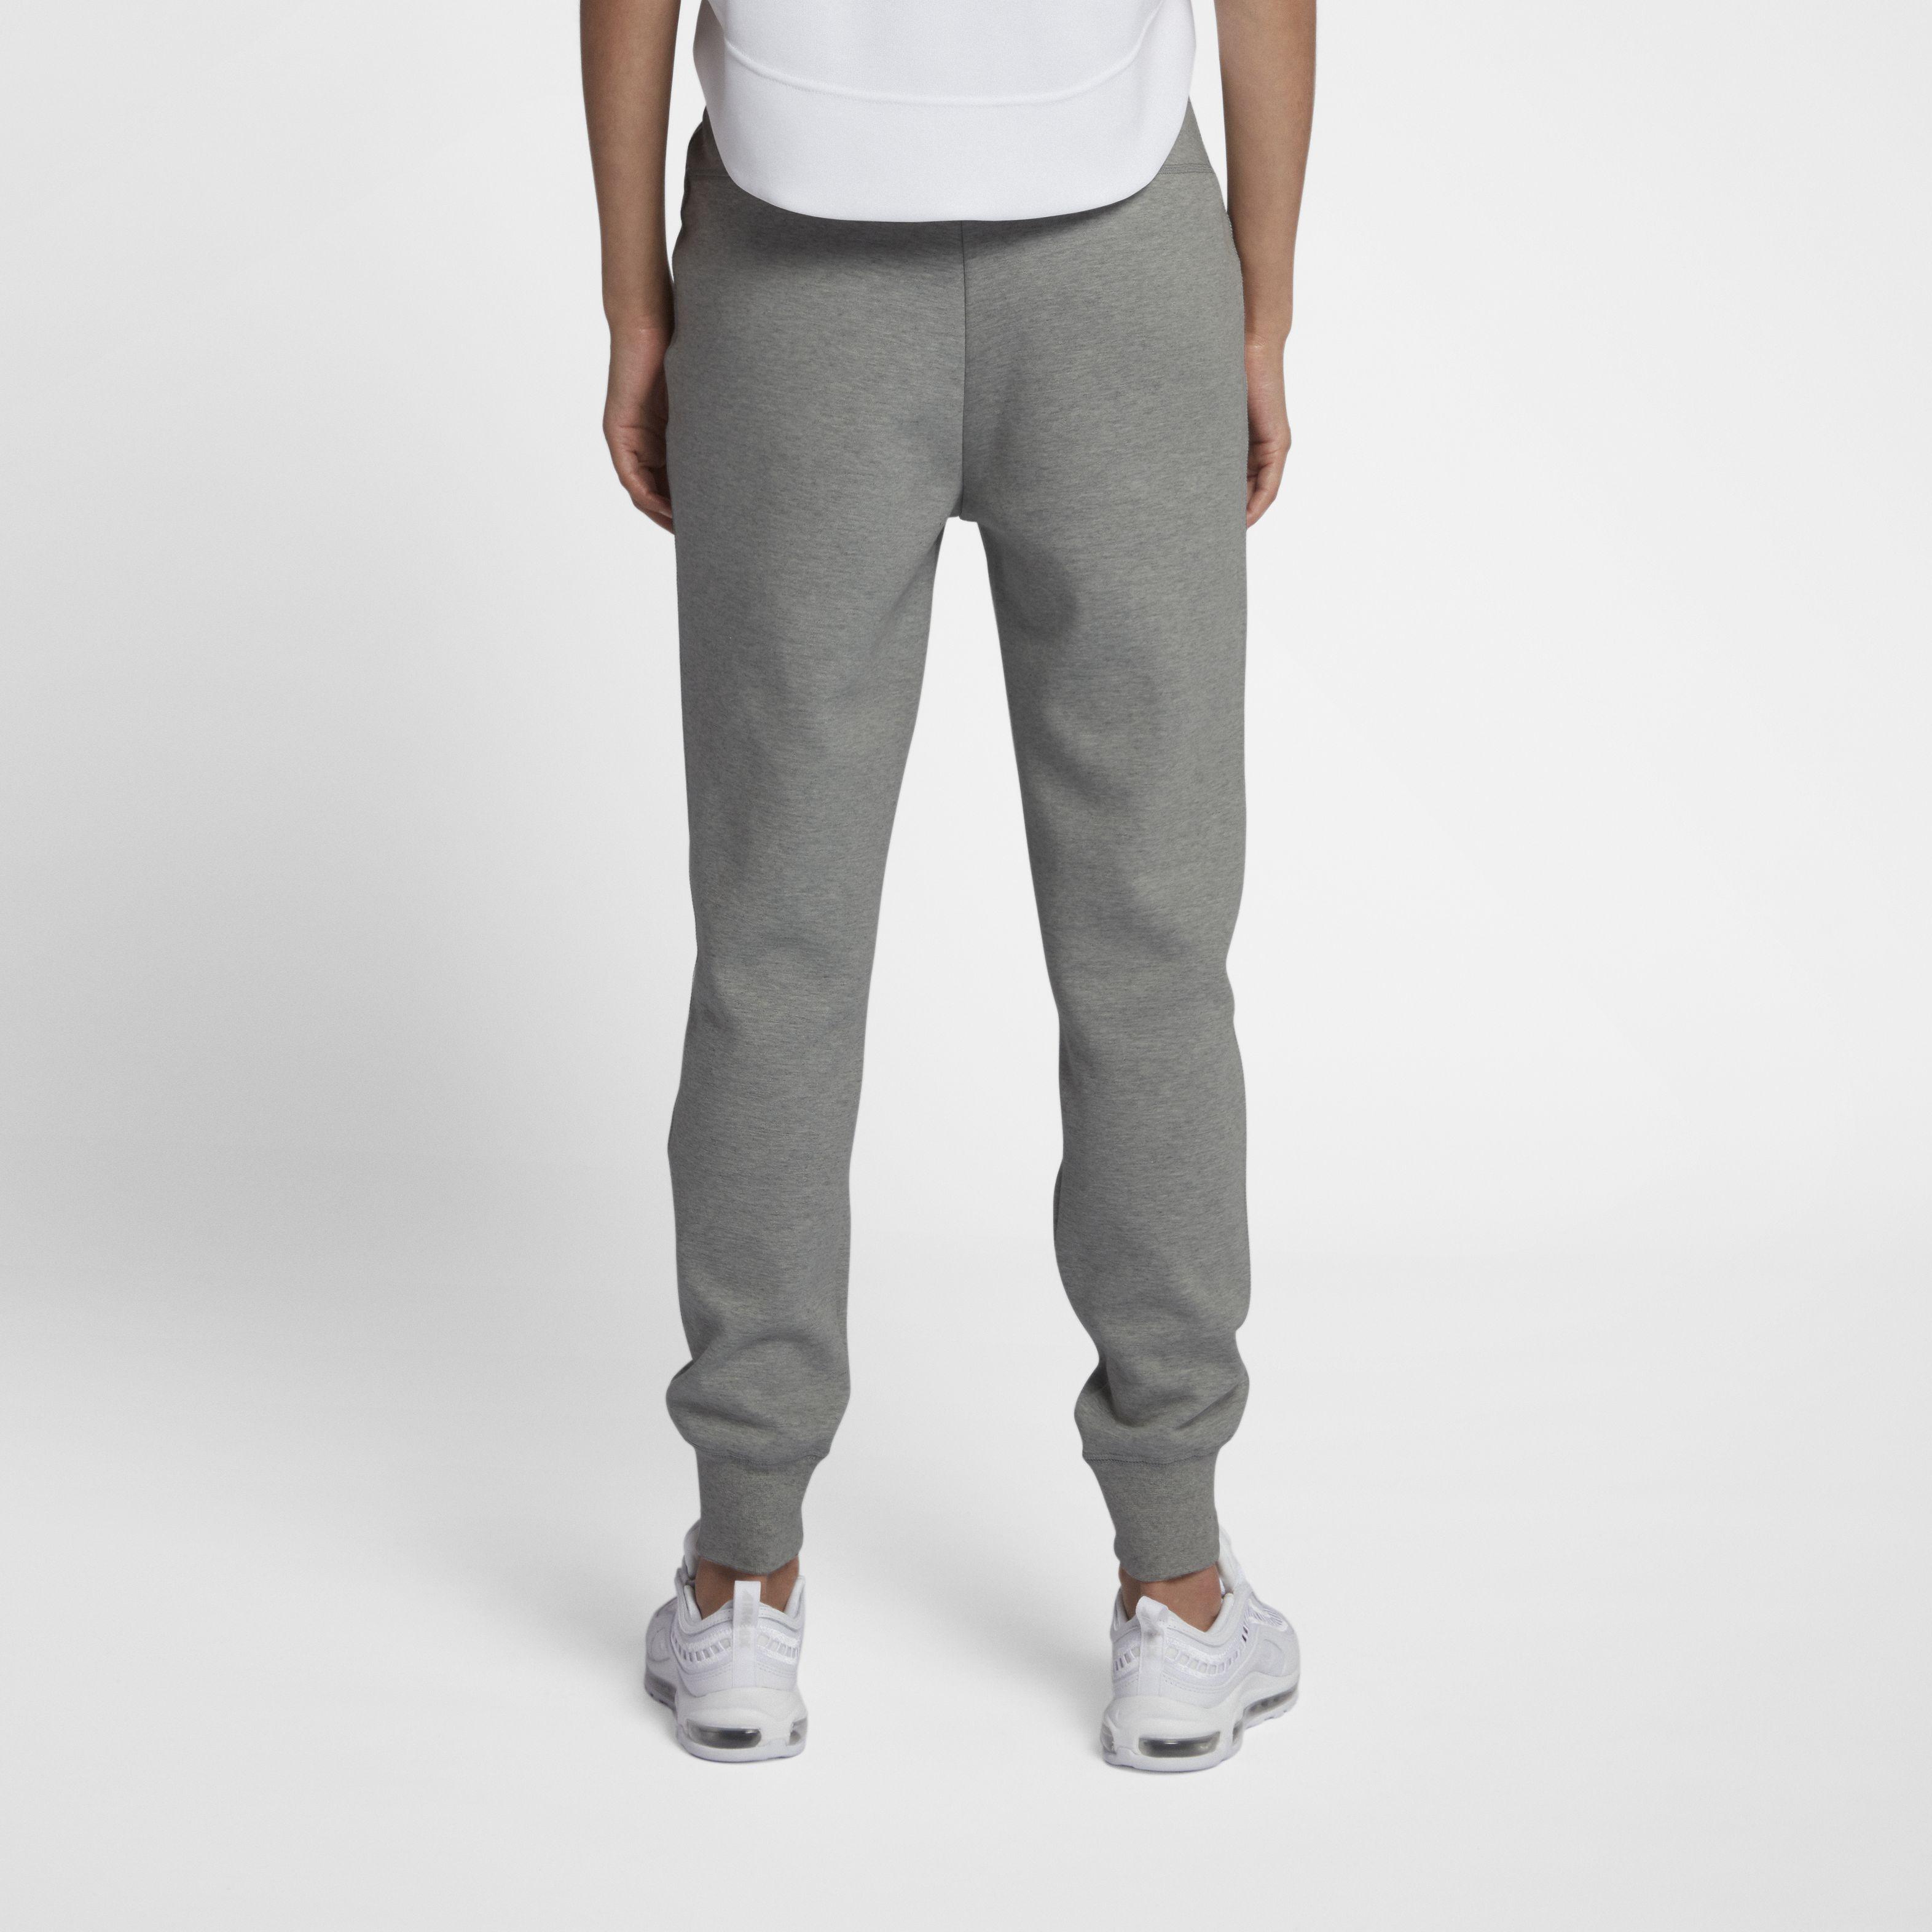 a8f735f1 Женские брюки Nike Tech Fleece Pant Dk Grey Heather/Matte Silver/White -  фото